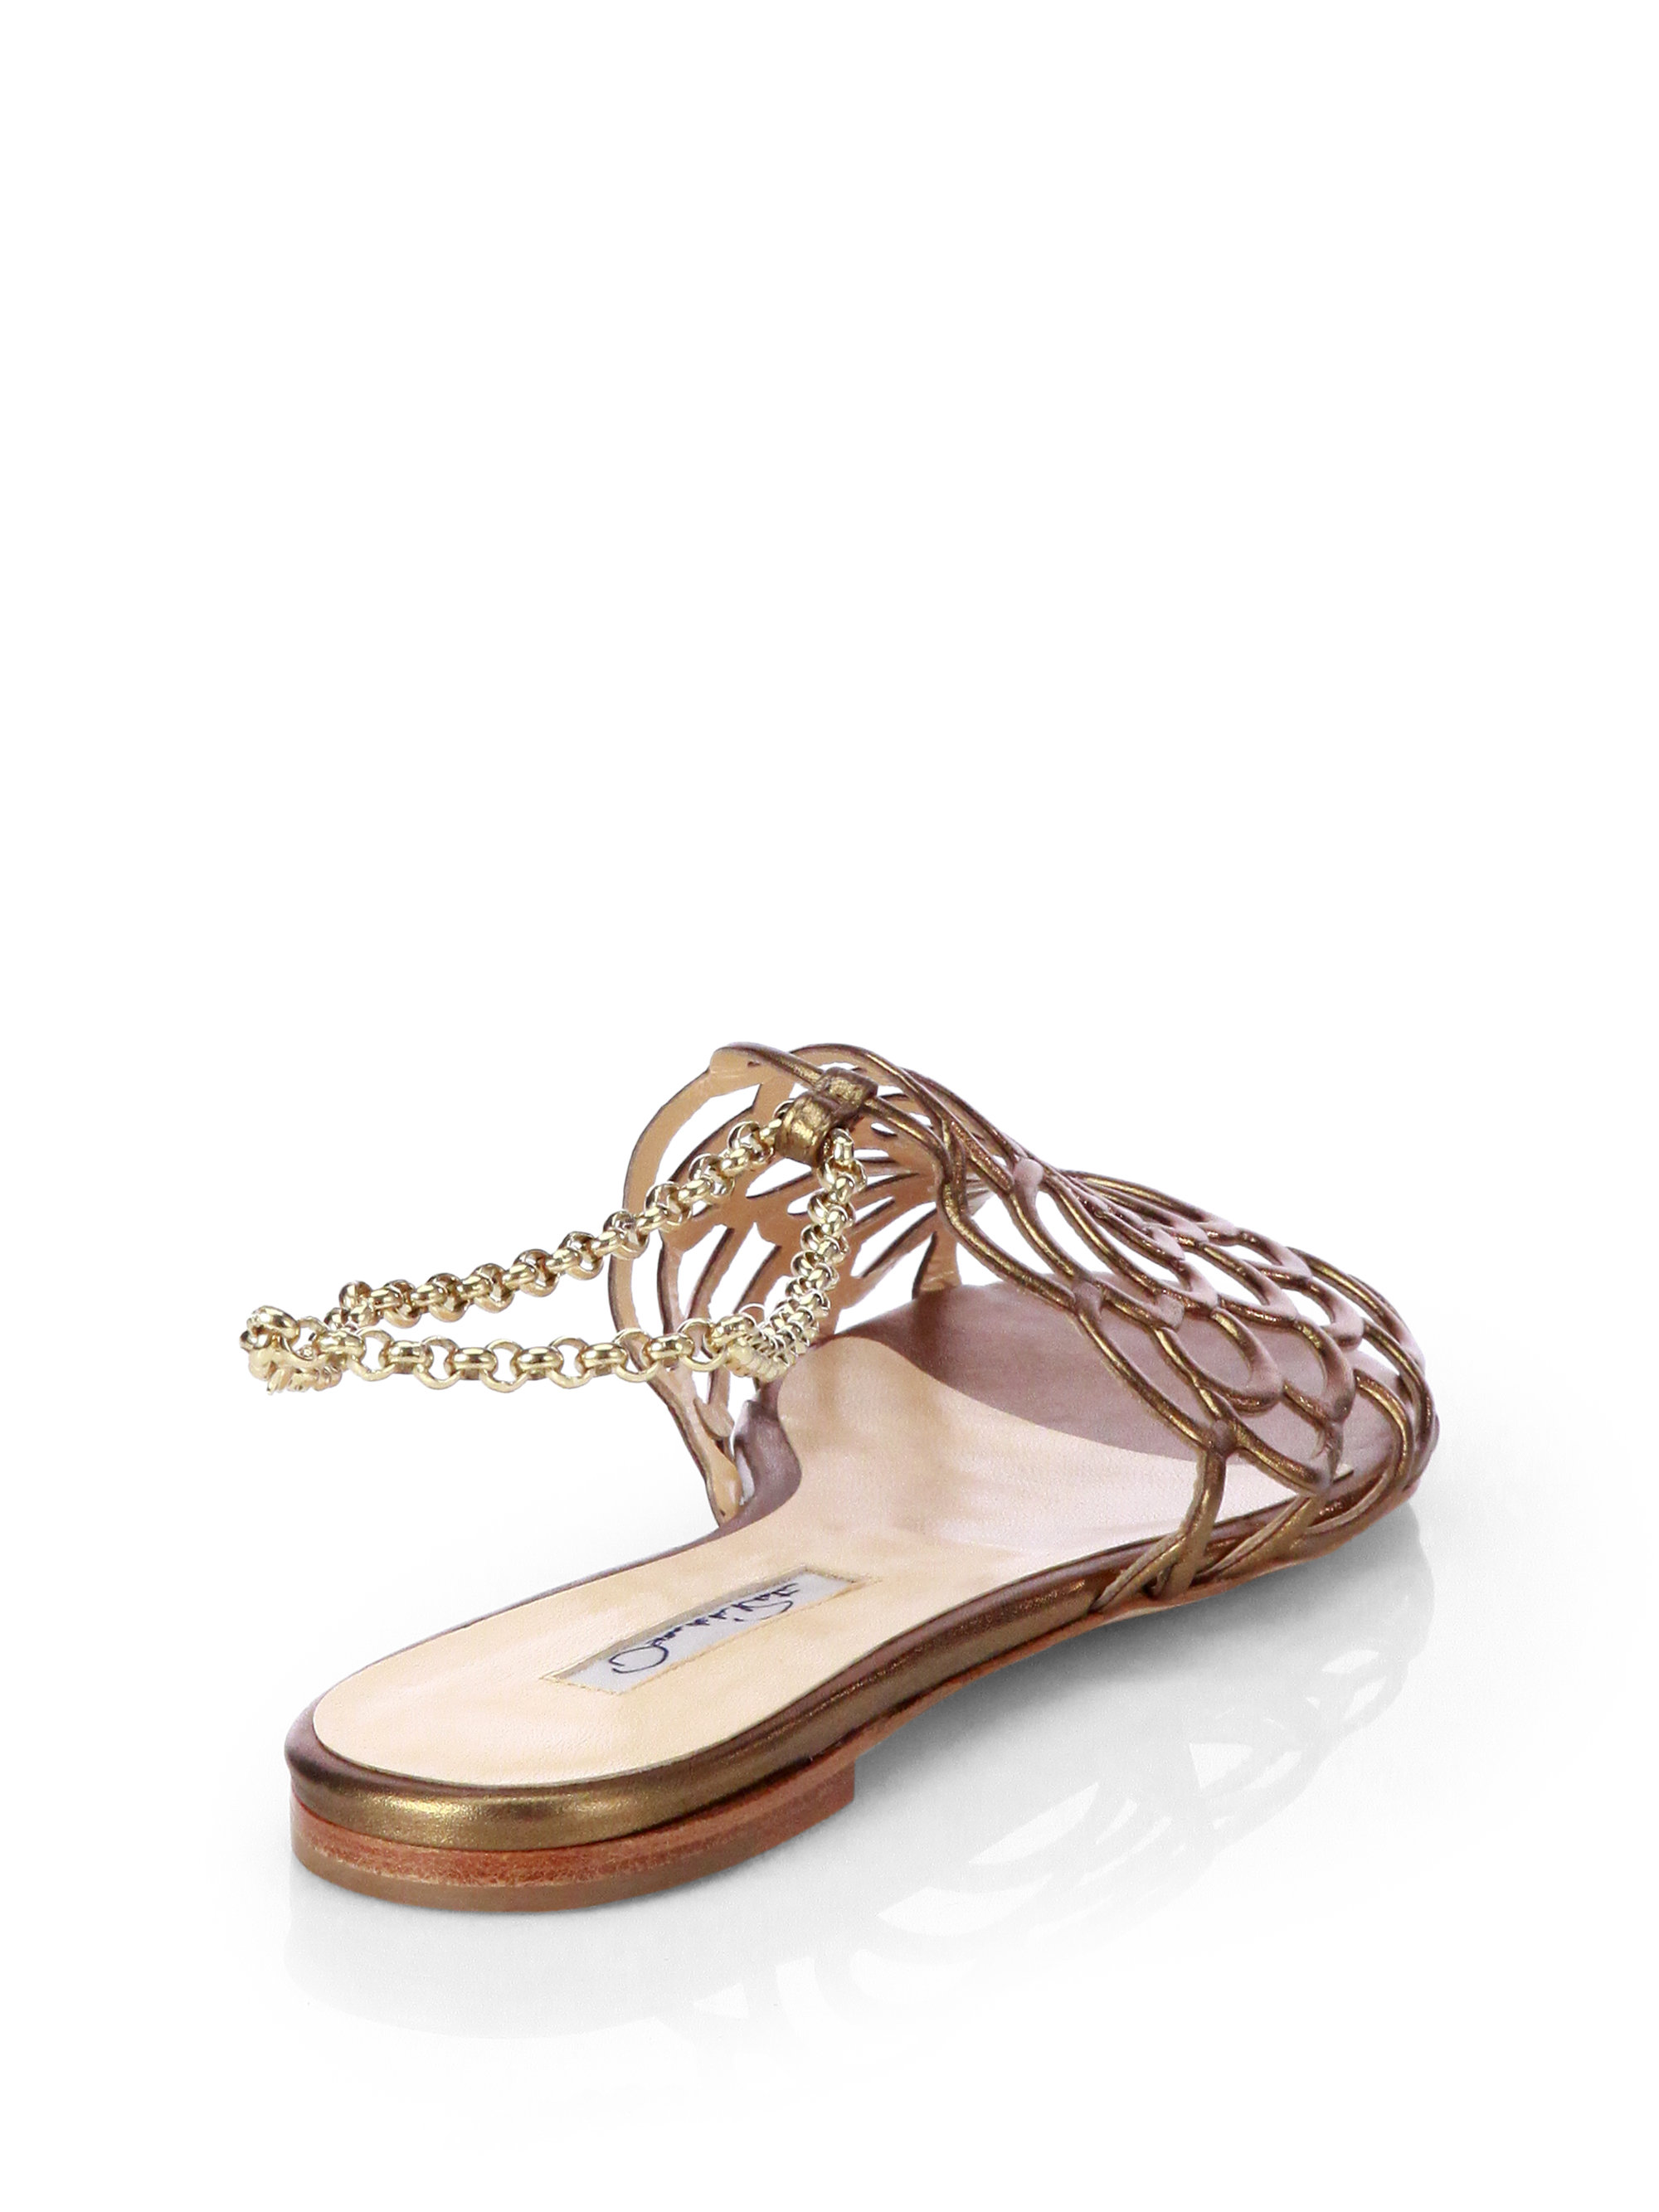 rhinestone embellished sandals - Metallic Oscar De La Renta Sale Marketable New Styles Outlet Supply Affordable QIe6E